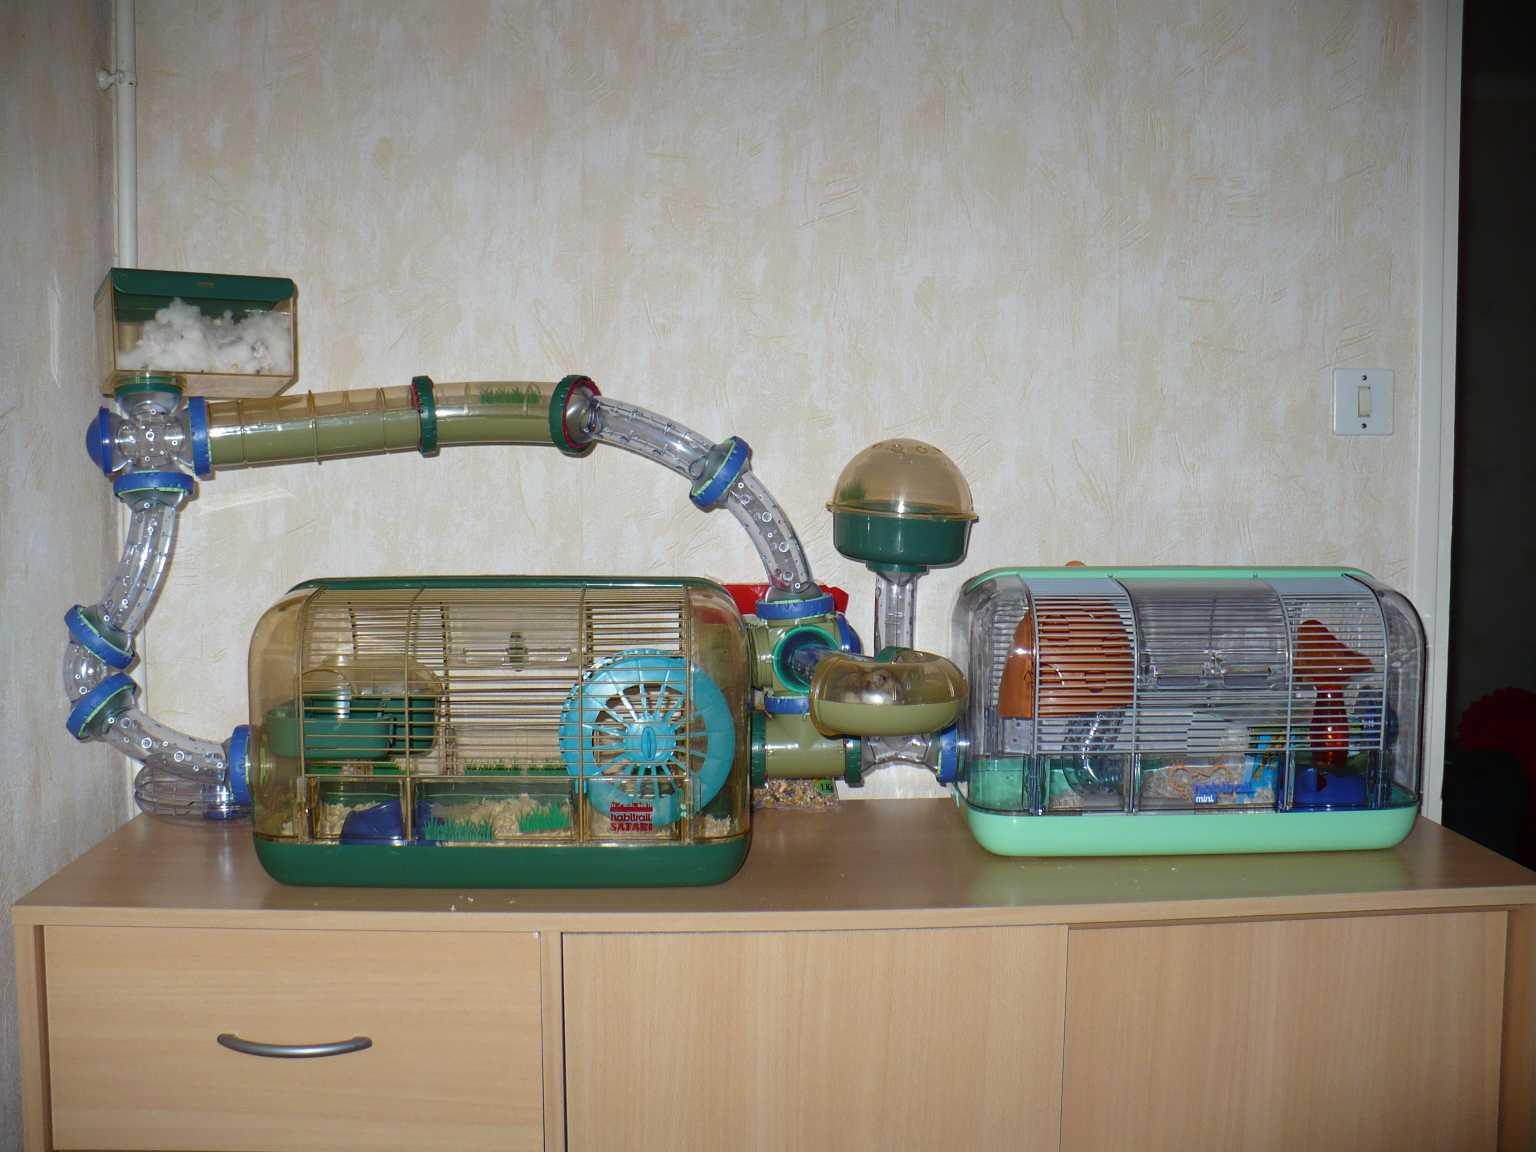 Donne hamster russe - La plus grande cage a hamster du monde ...